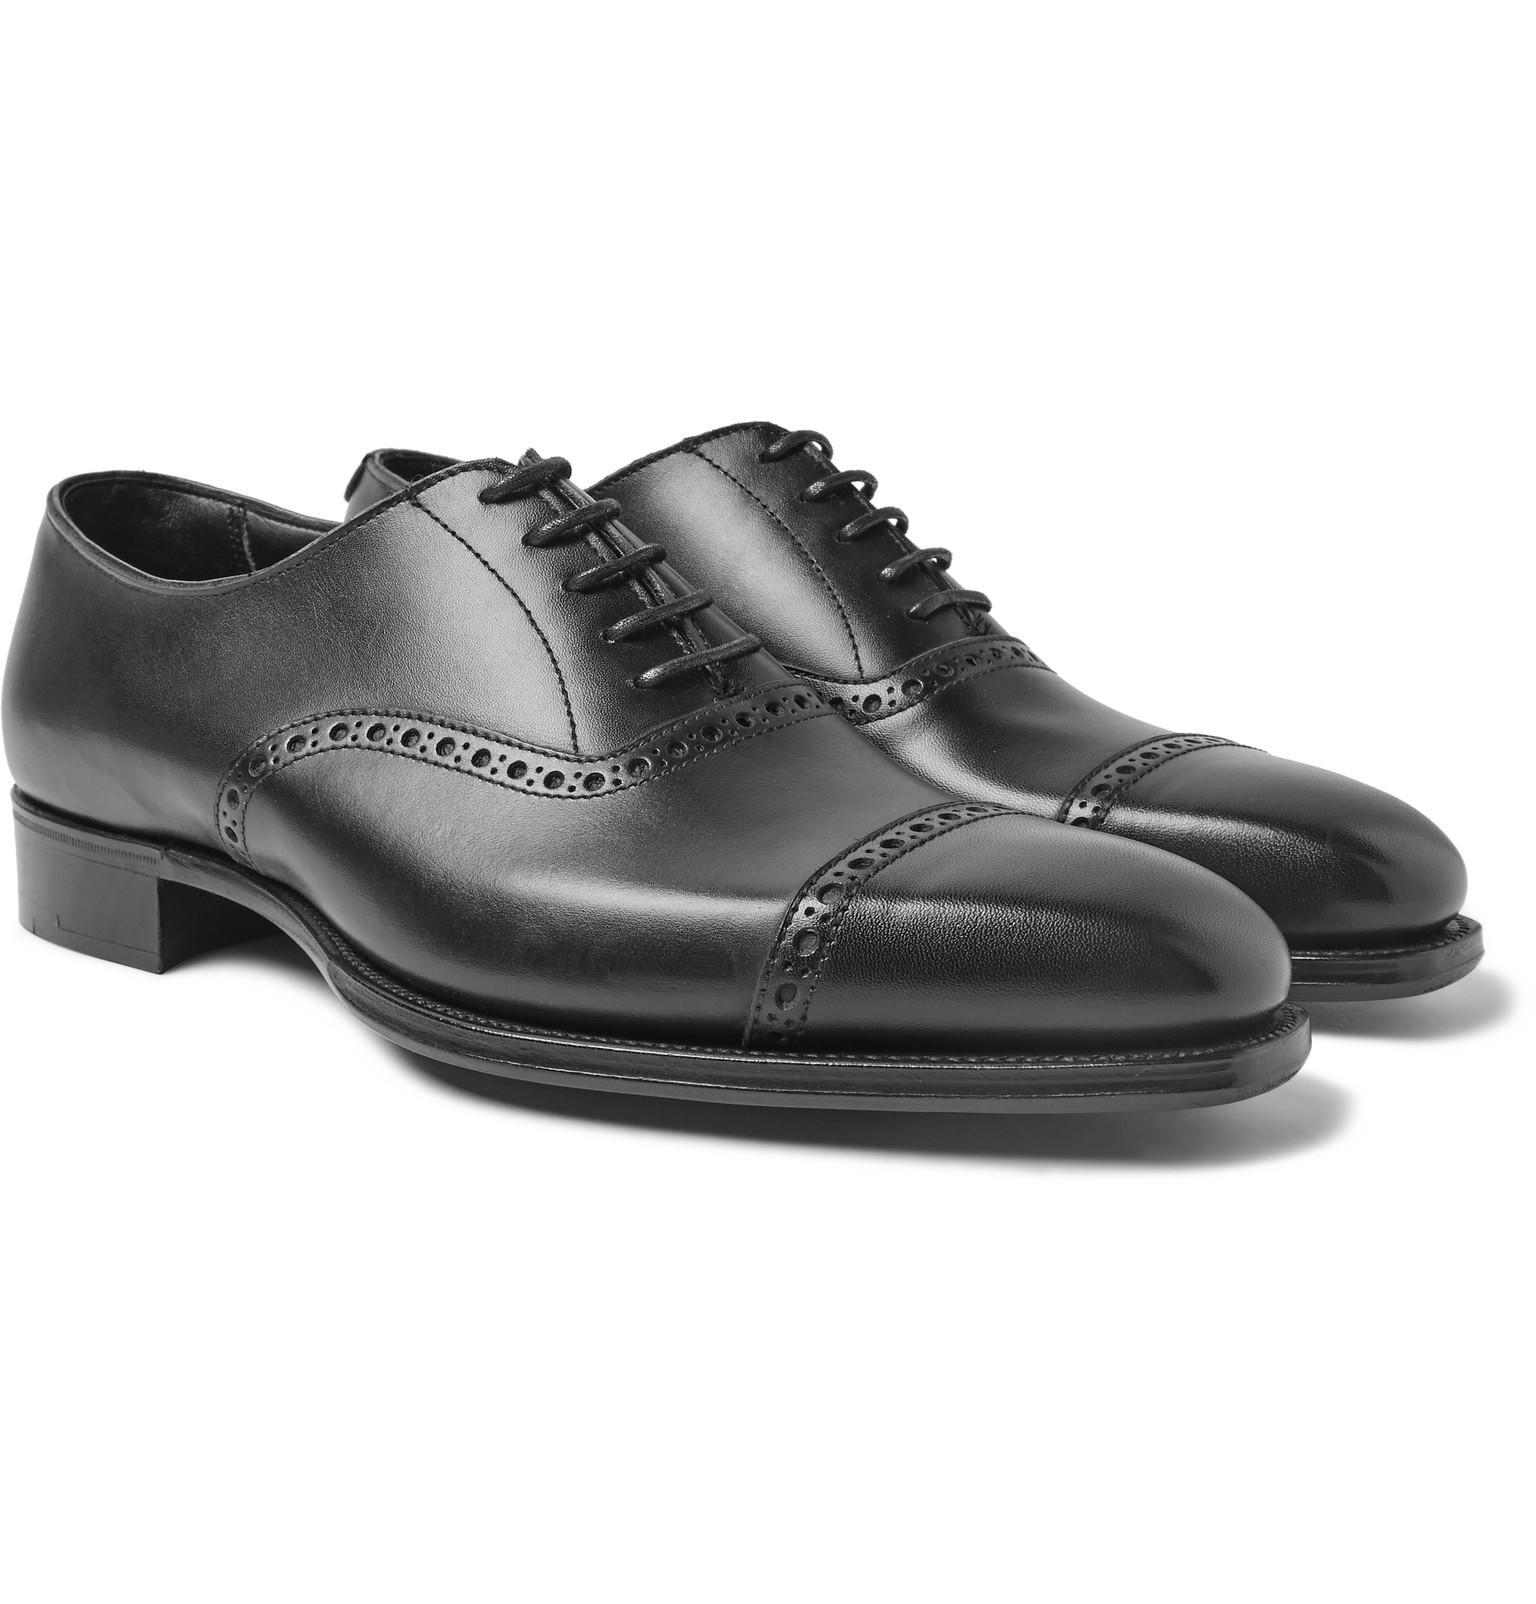 Adam Pebble-grain Leather Oxford Brogues - BlackGeorge Cleverley D4F3W4vj